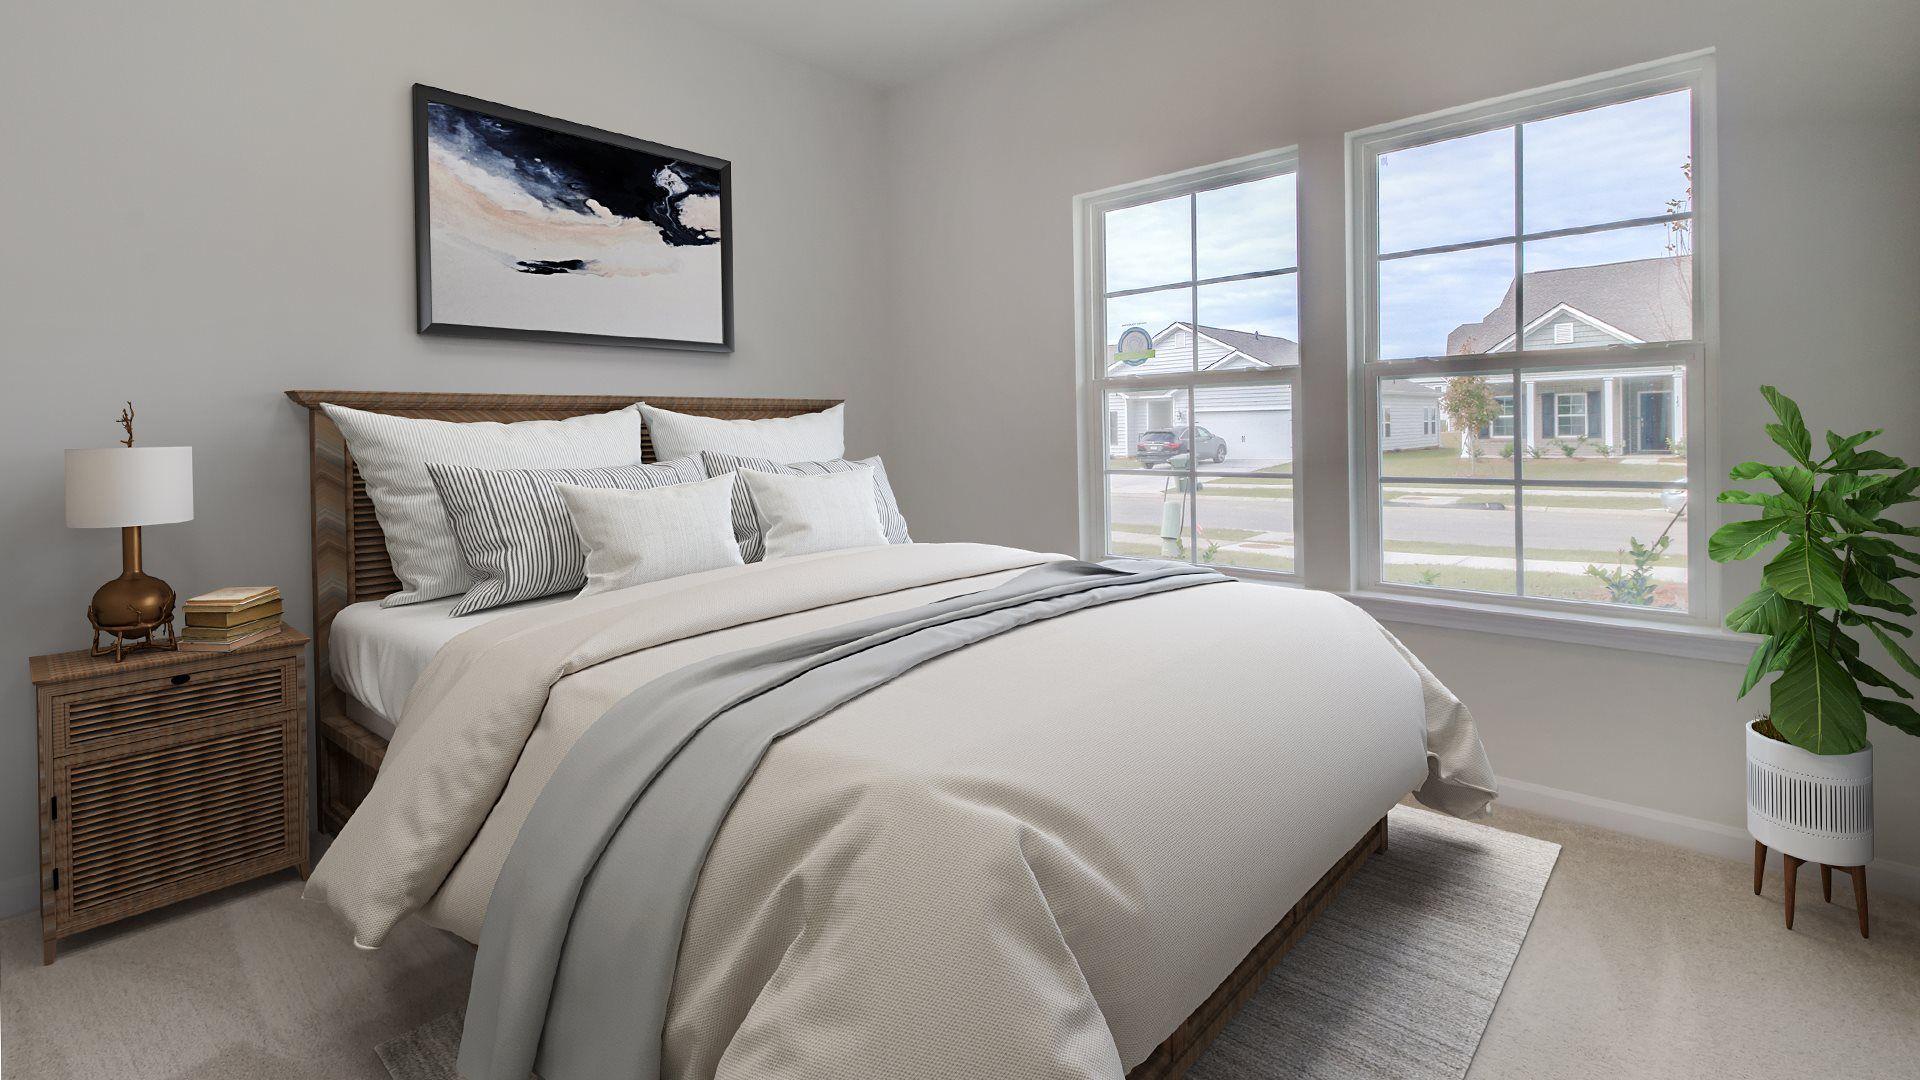 Bedroom featured in the BELHAVEN II By Lennar in Myrtle Beach, SC